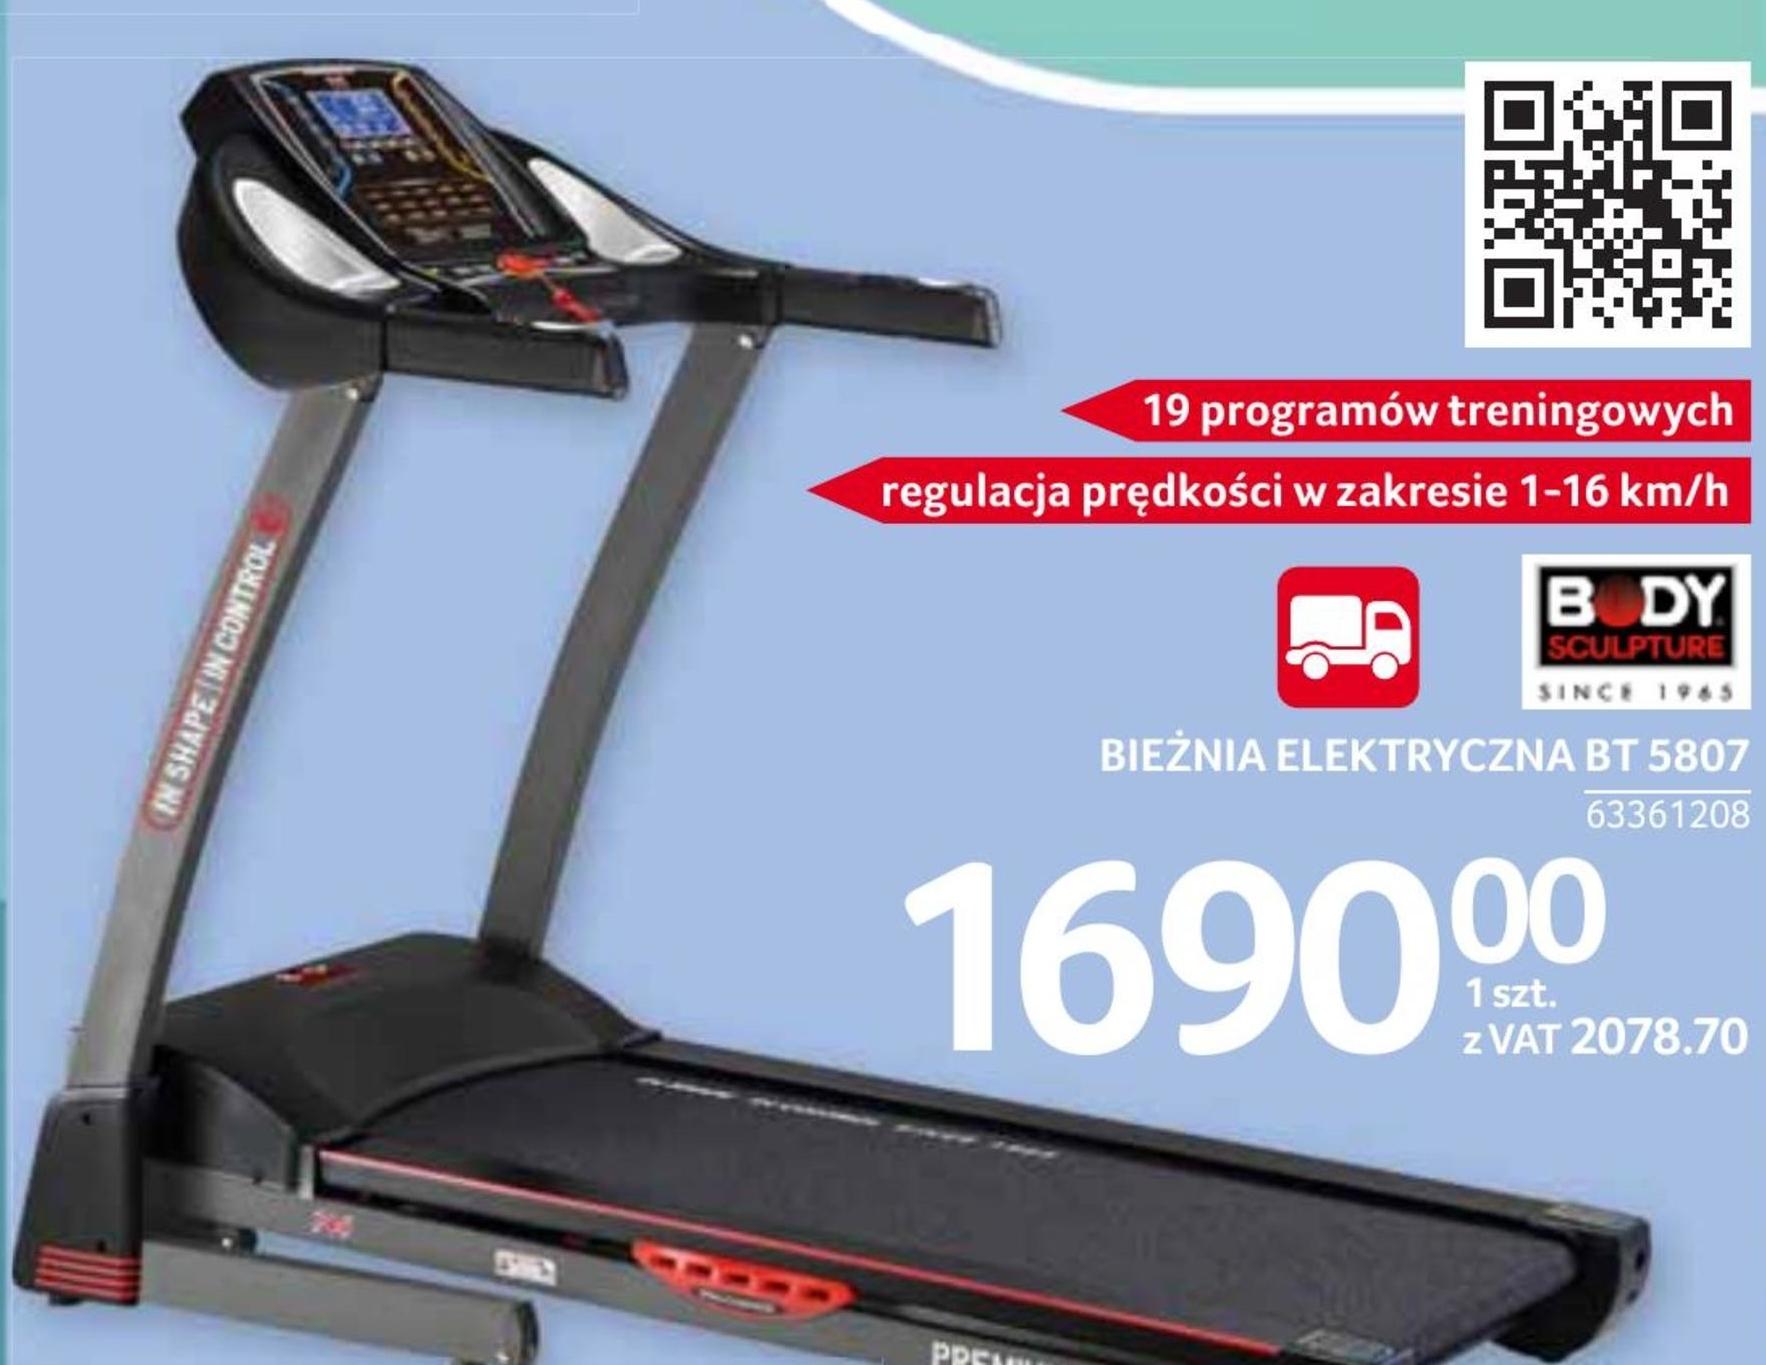 Bieżnia elektryczna BT 5807 Body Sculpture niska cena